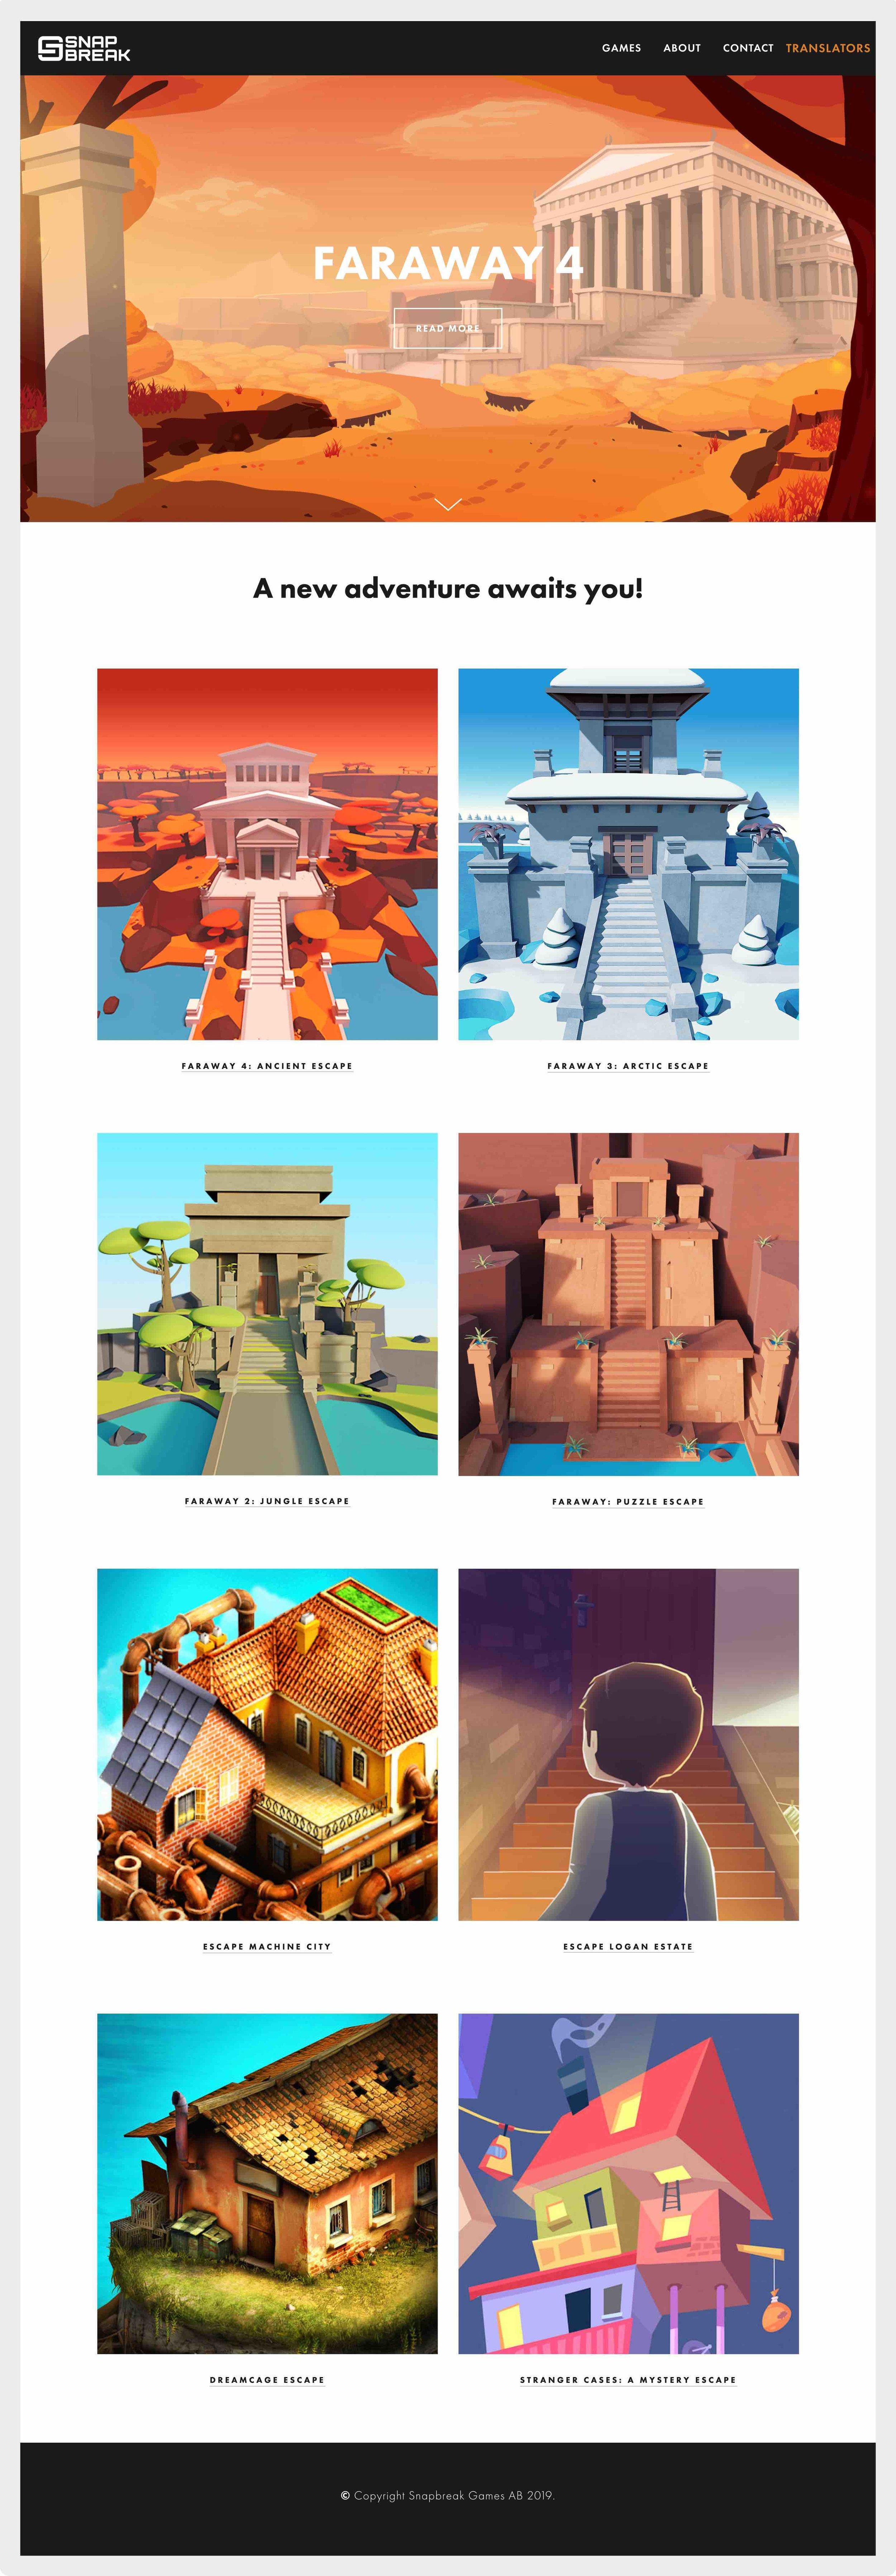 framtidens-webbyrå-uppdrag--hemsida-snapbreak-games-startsida